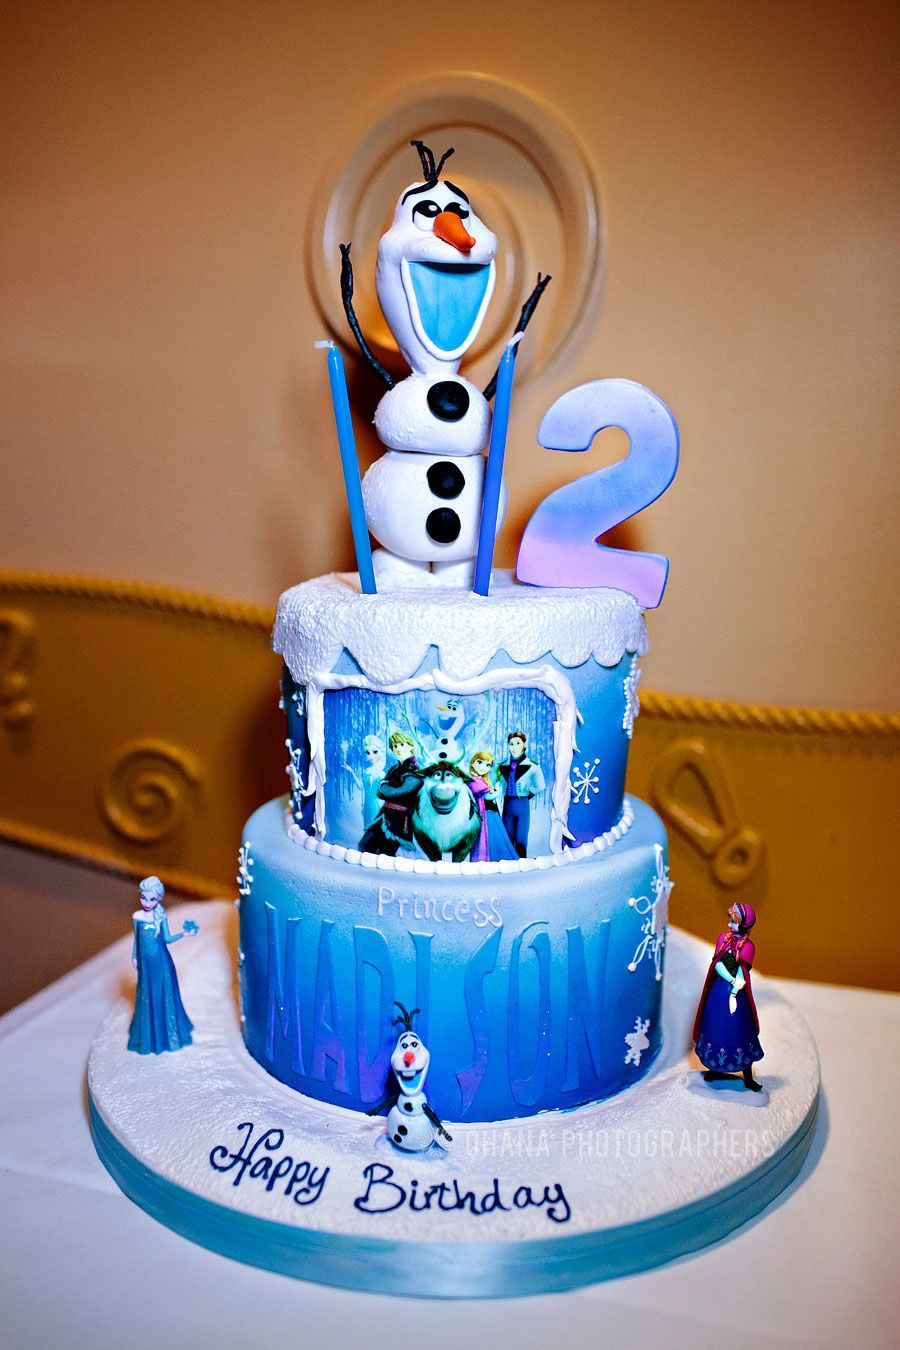 Best ideas about Disneyland Birthday Cake . Save or Pin Frozen Theme Birthday Party Frozen Theme Birthday Cake Now.